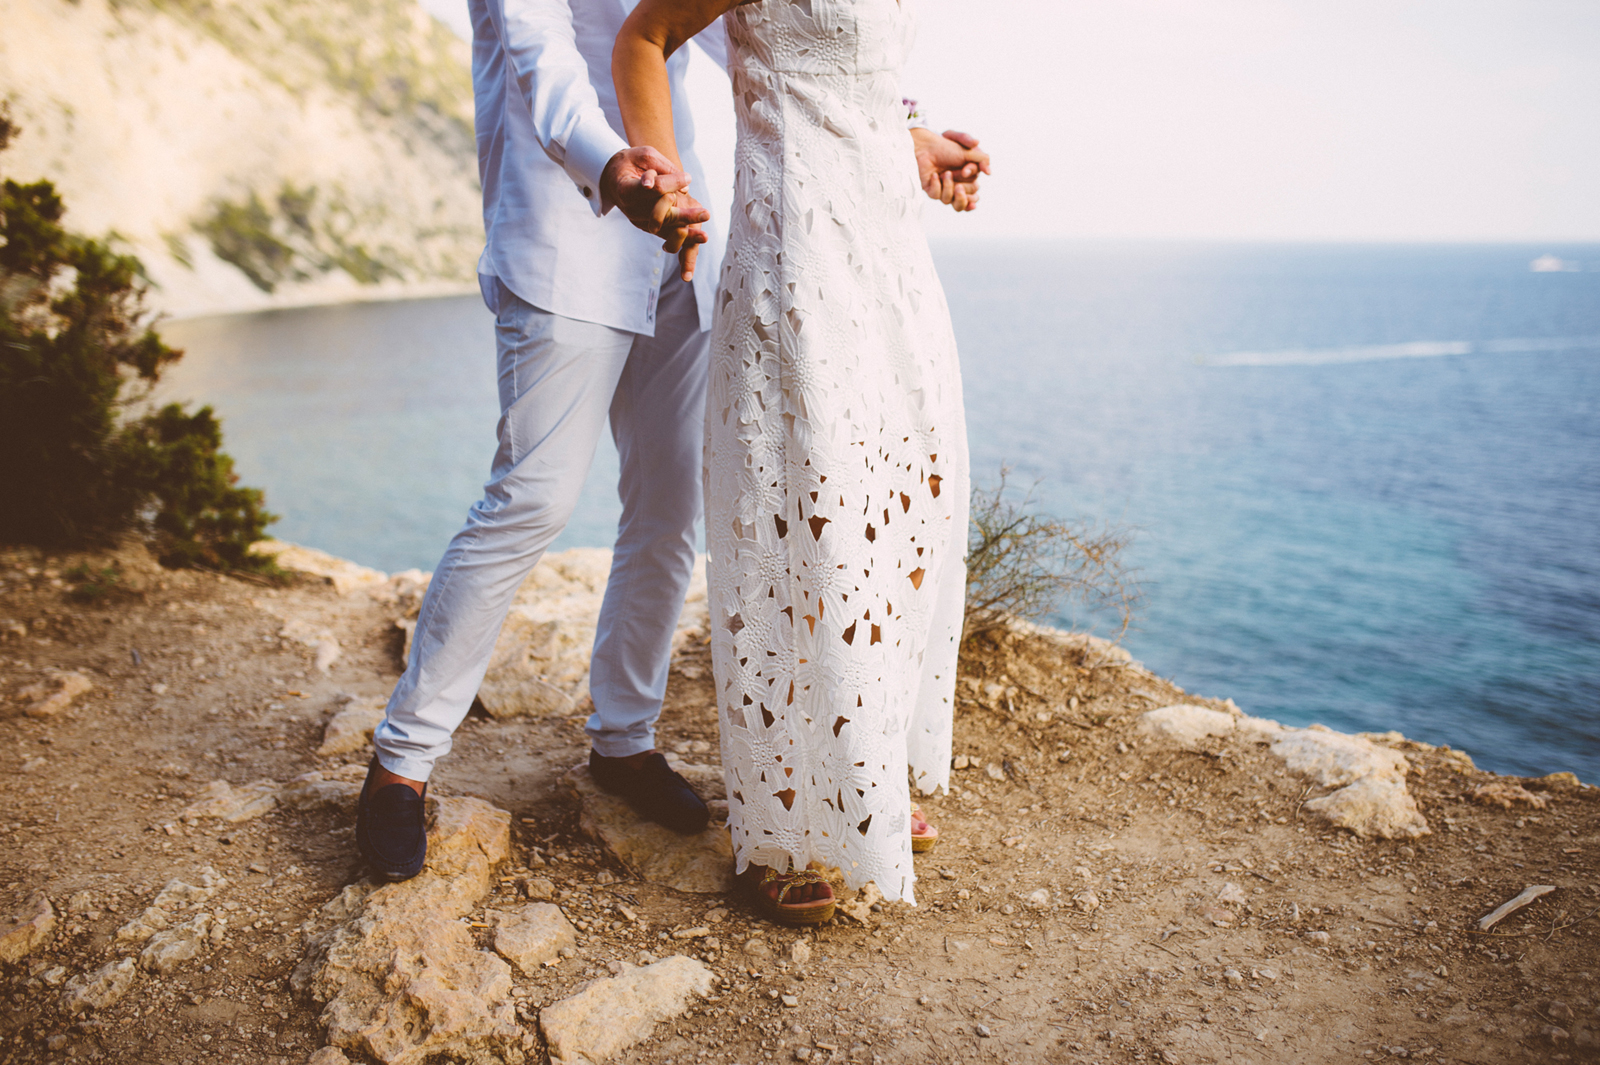 Hochzeitsfotograf_Ibiza_110.jpg